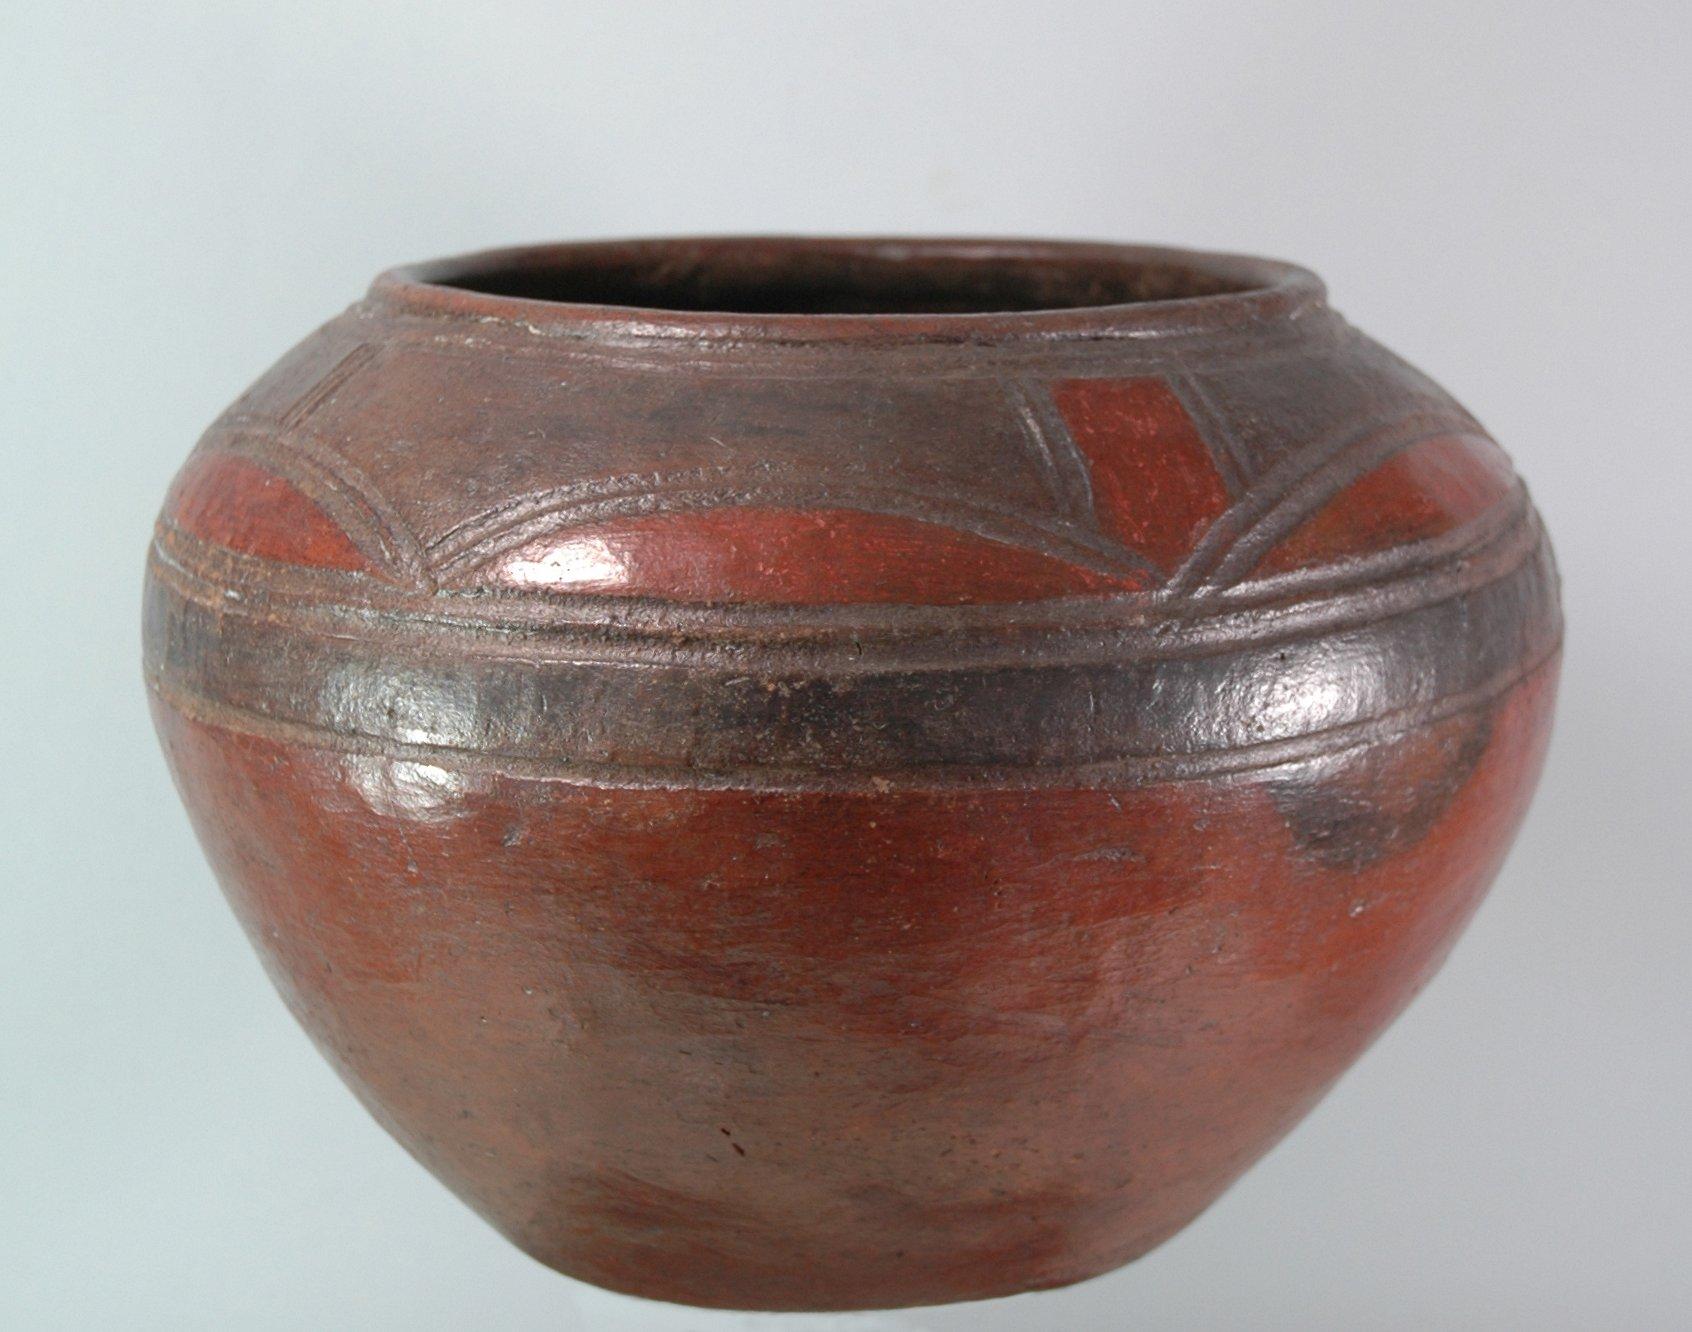 Venda vessel